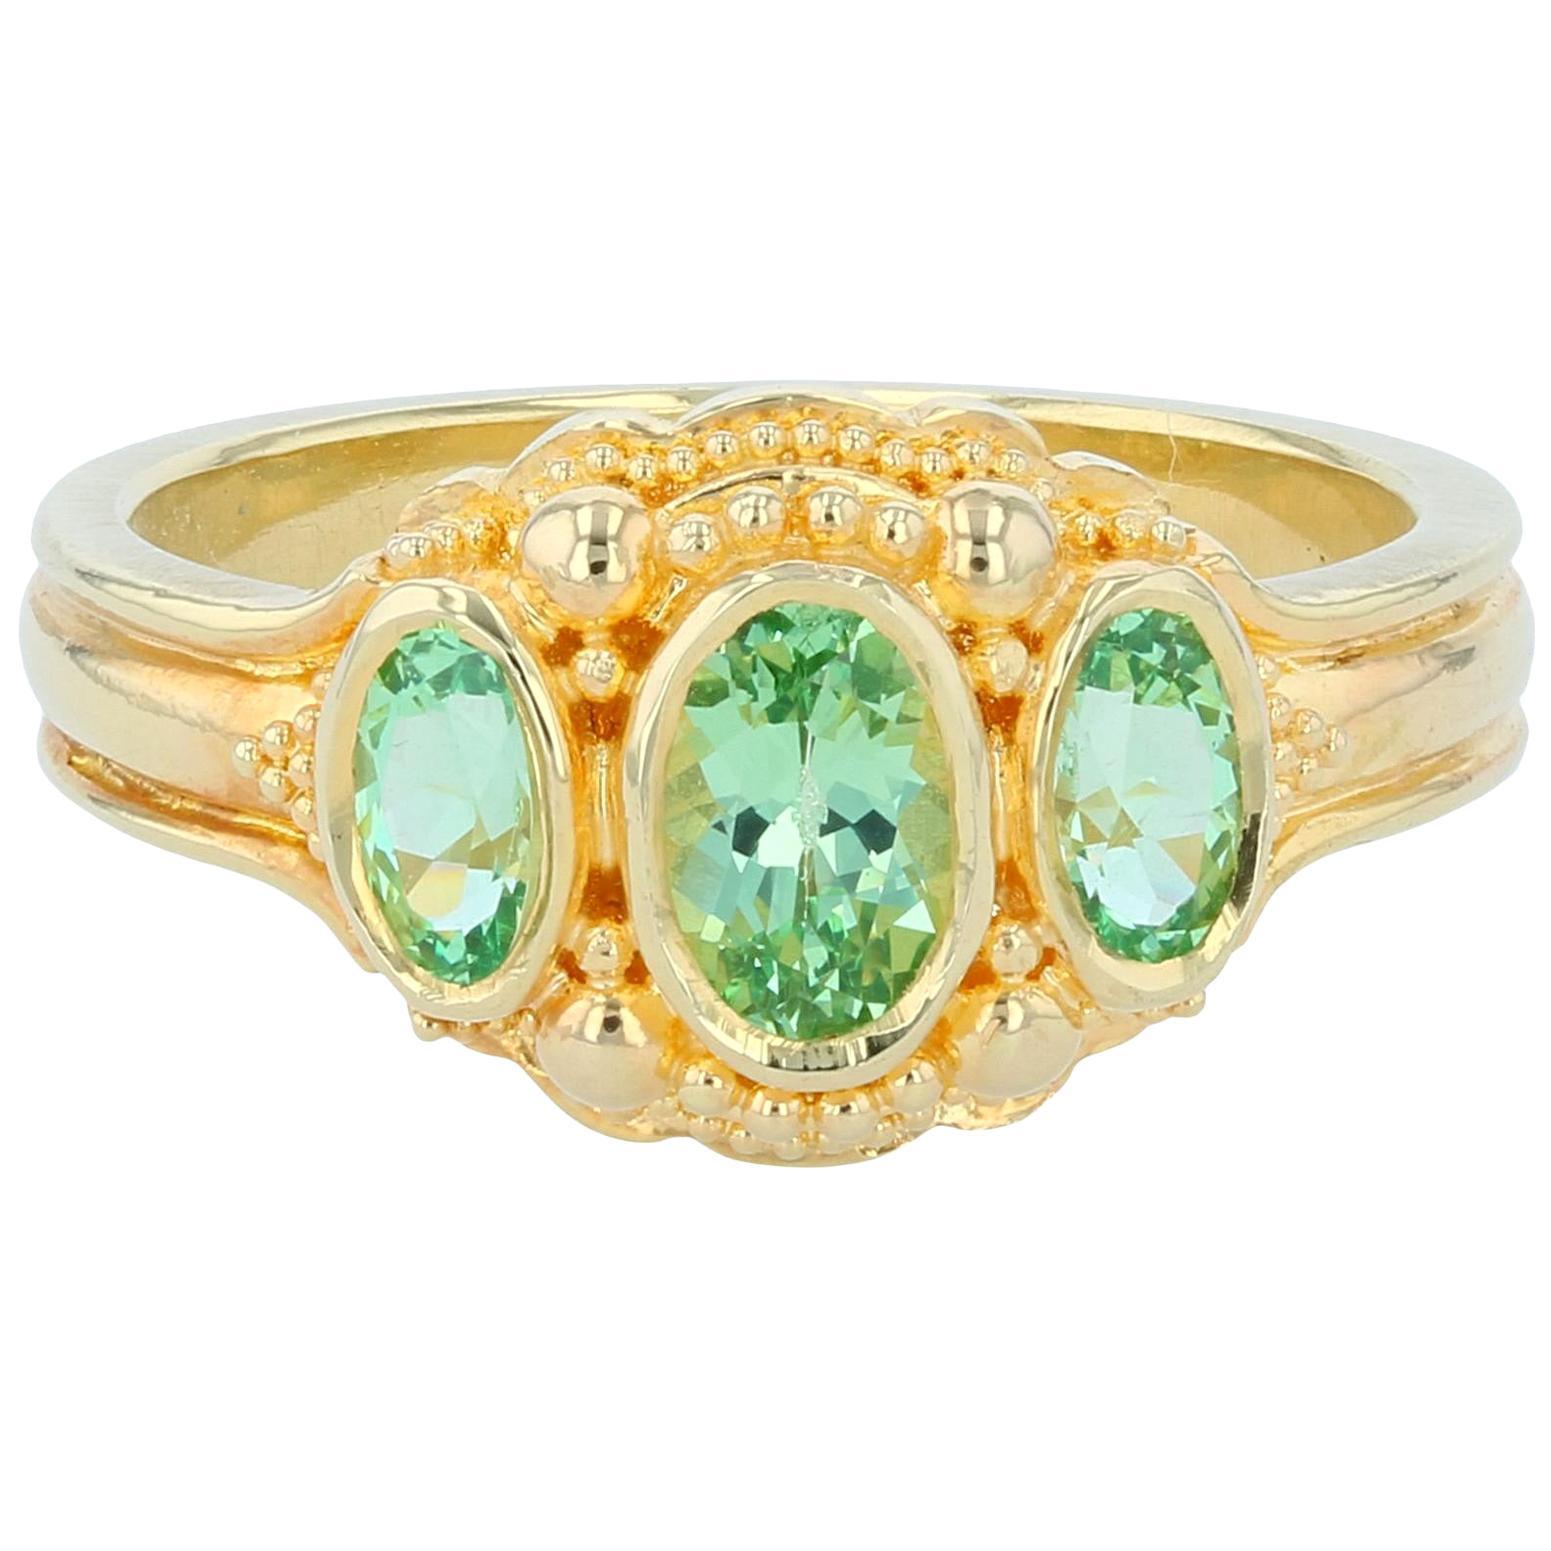 Kent Raible Bright Green Garnet Three-Stone Ring with Fine 18k Gold Granulation